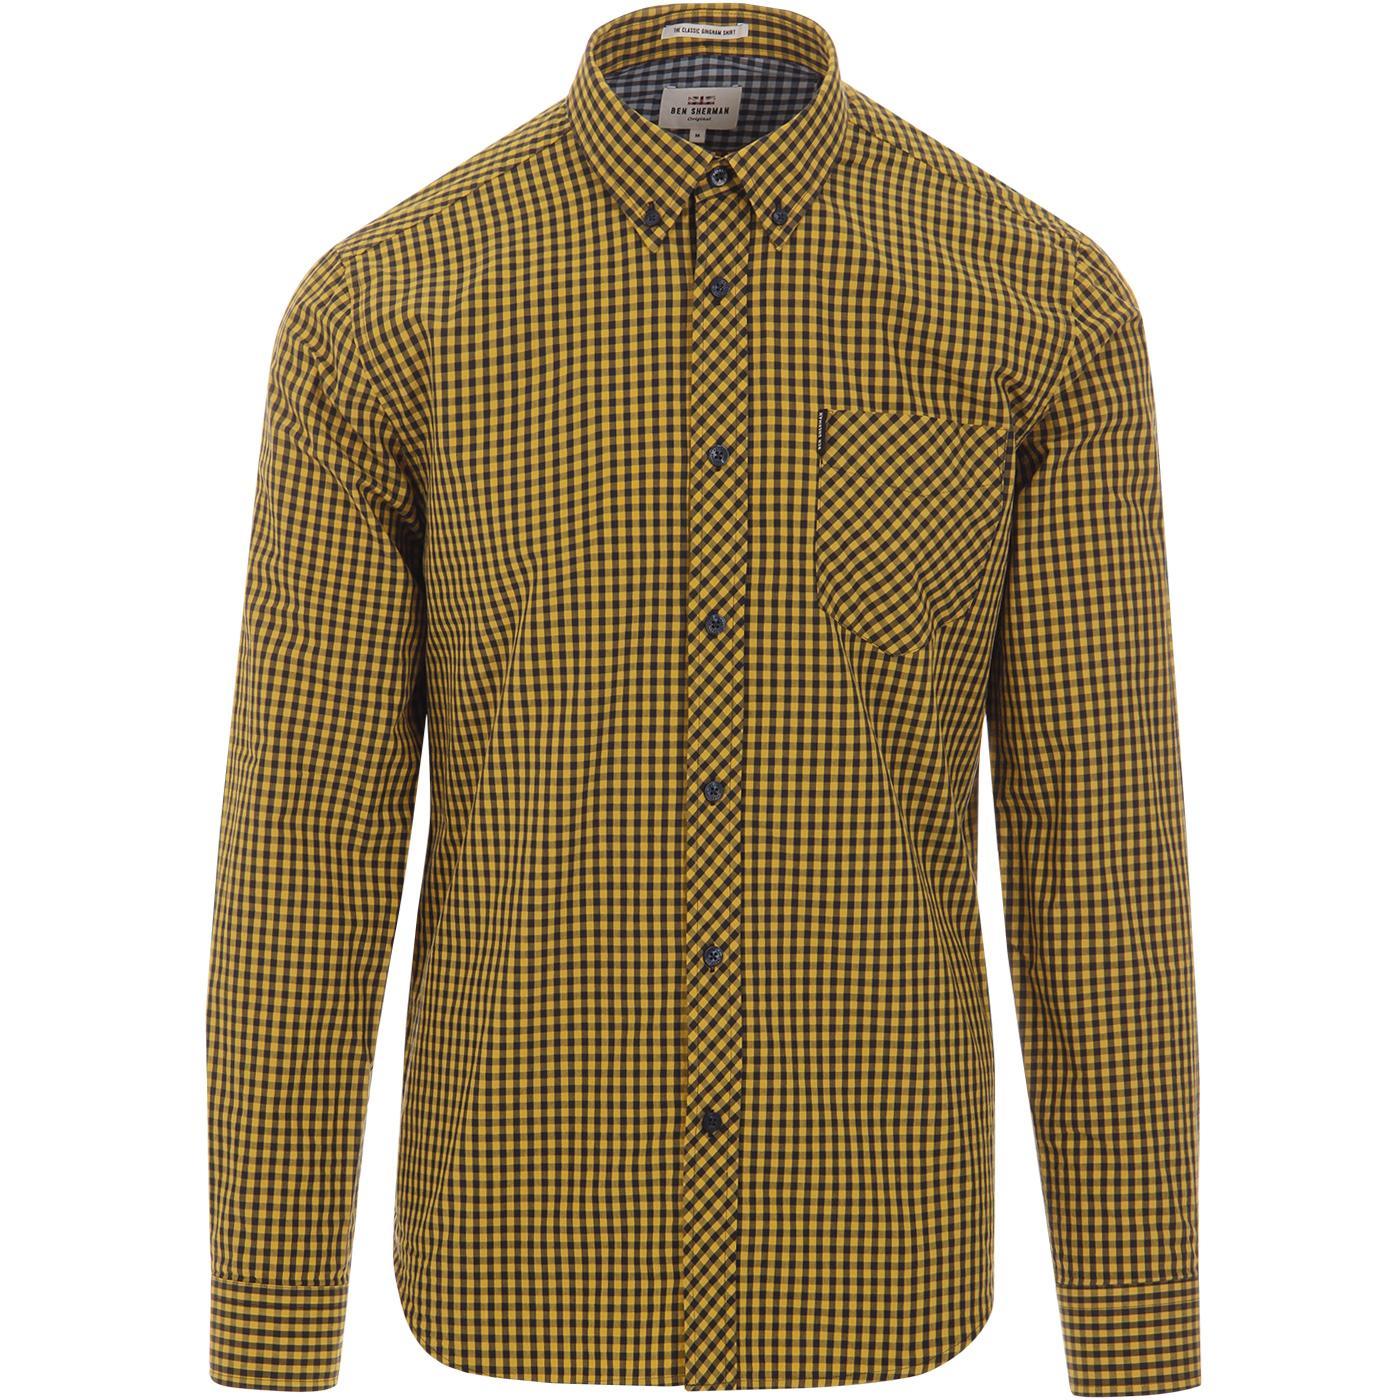 BEN SHERMAN Classic Retro Mod Gingham Check Shirt